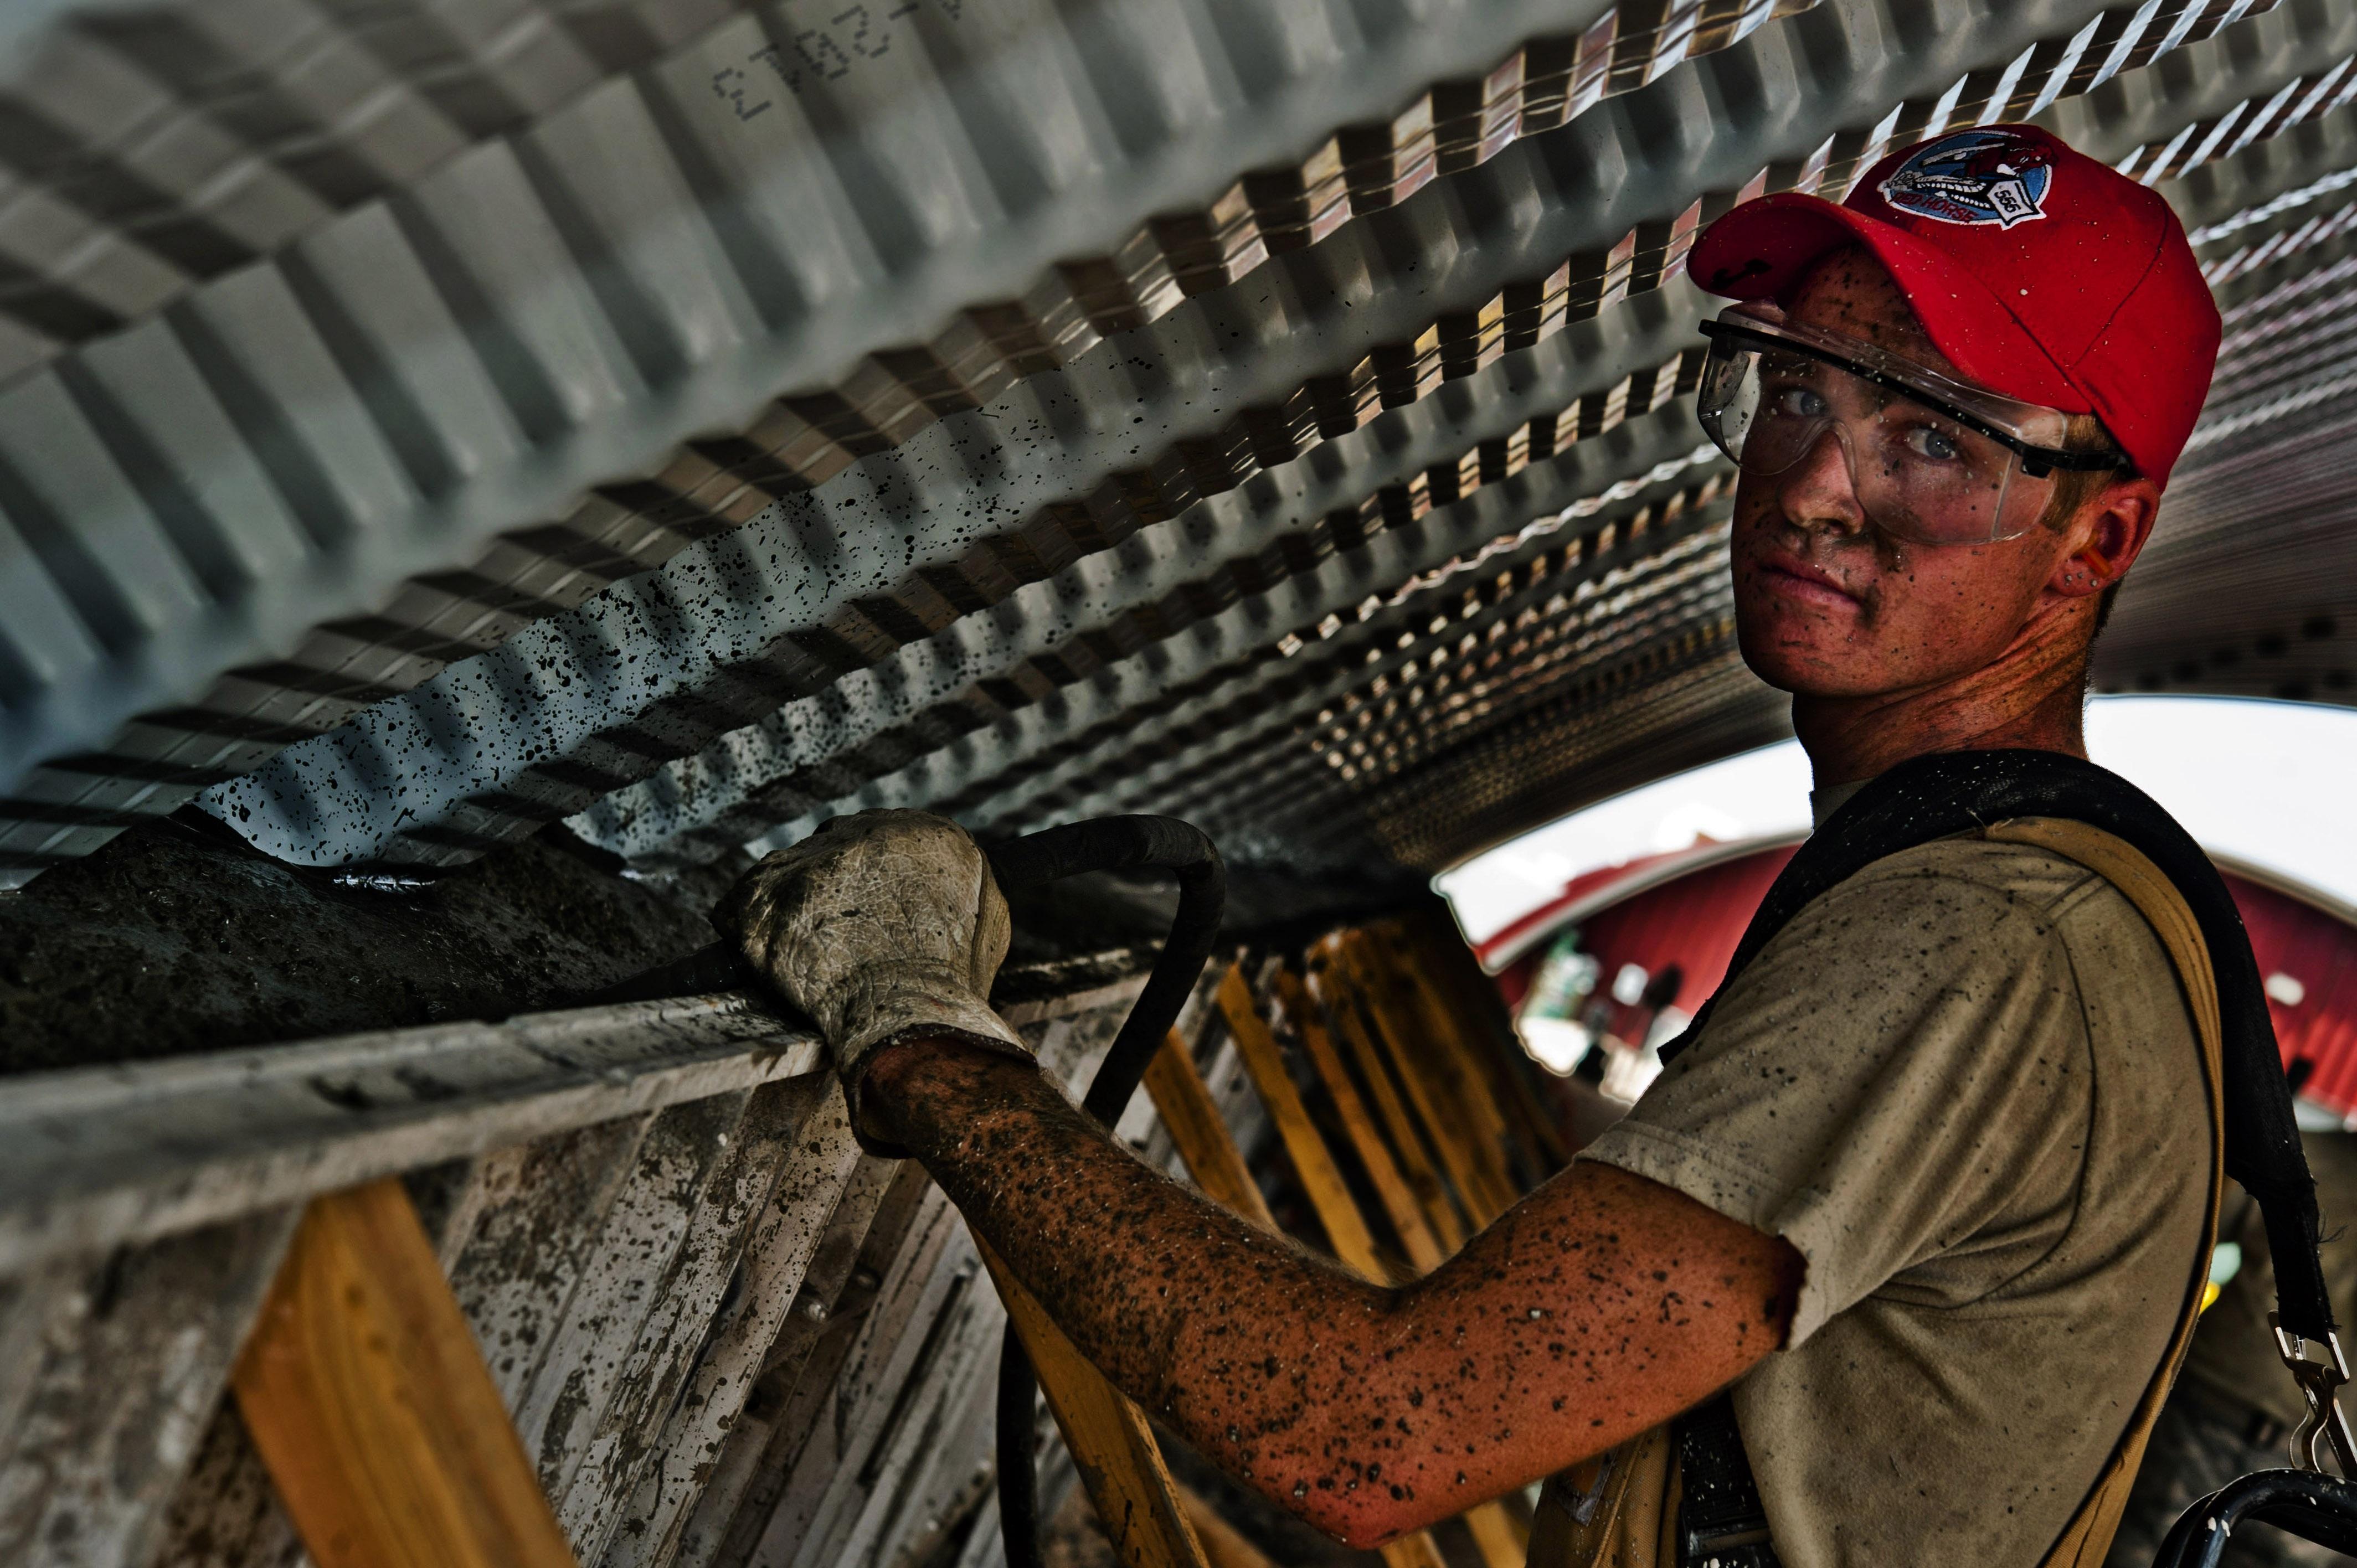 construction-worker-concrete-hummer-vibrator-38600.jpeg